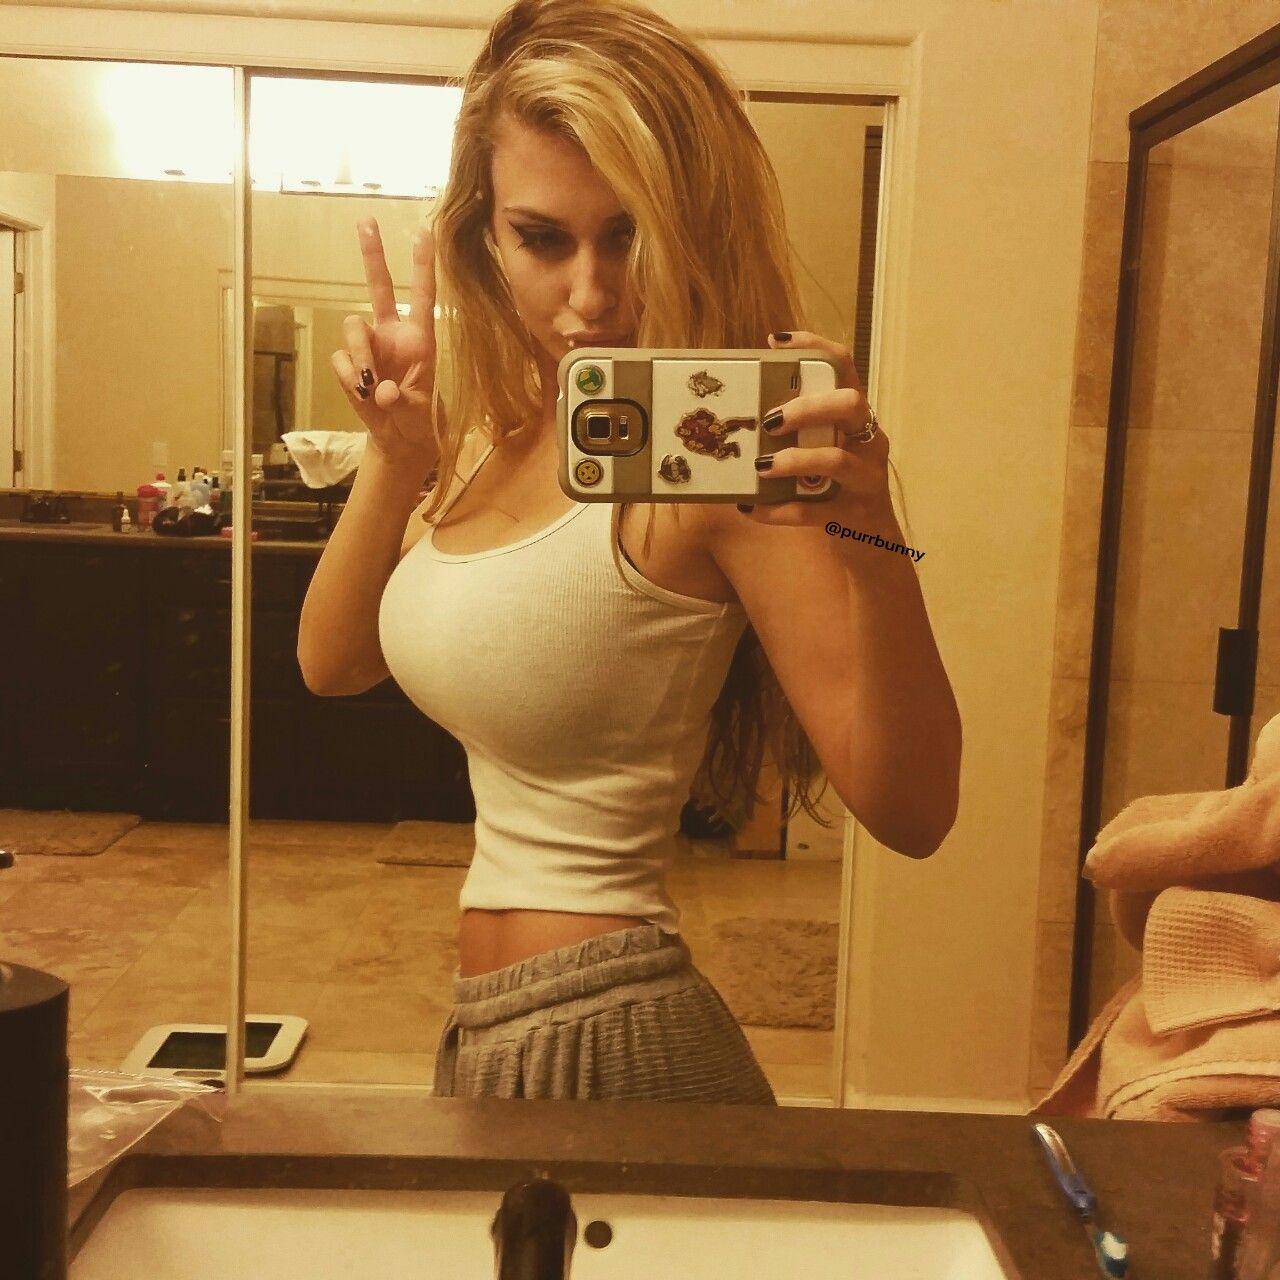 Big boob small blouse